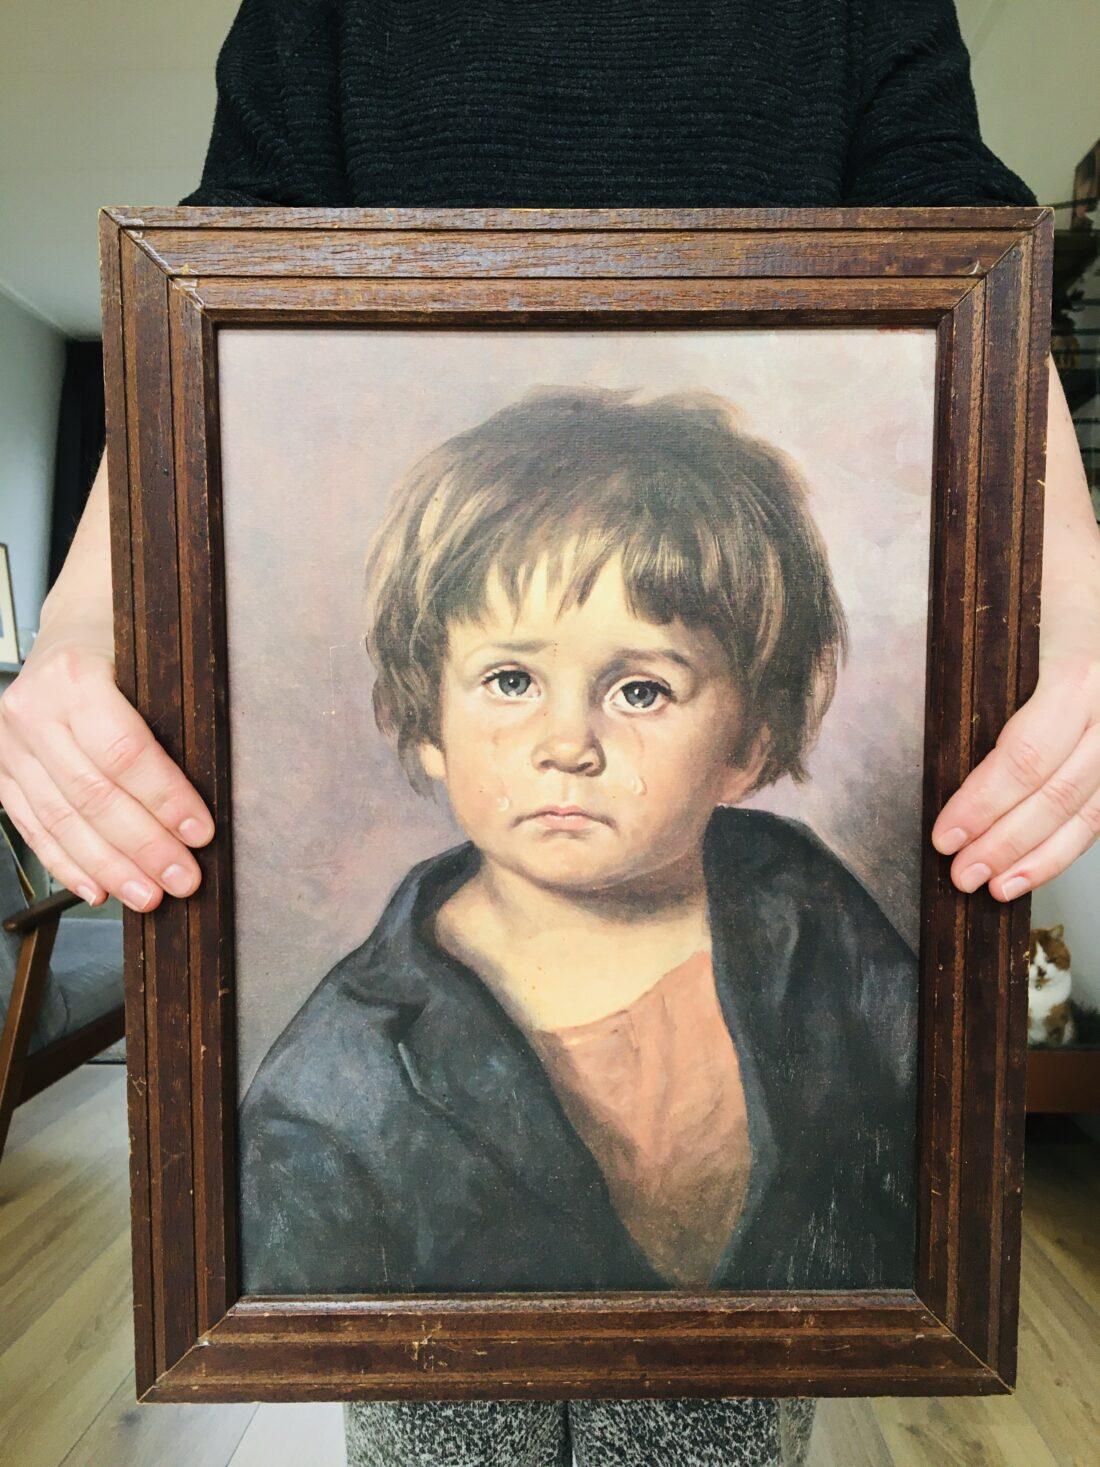 Vintage Bragolin huilend kindje schilderij